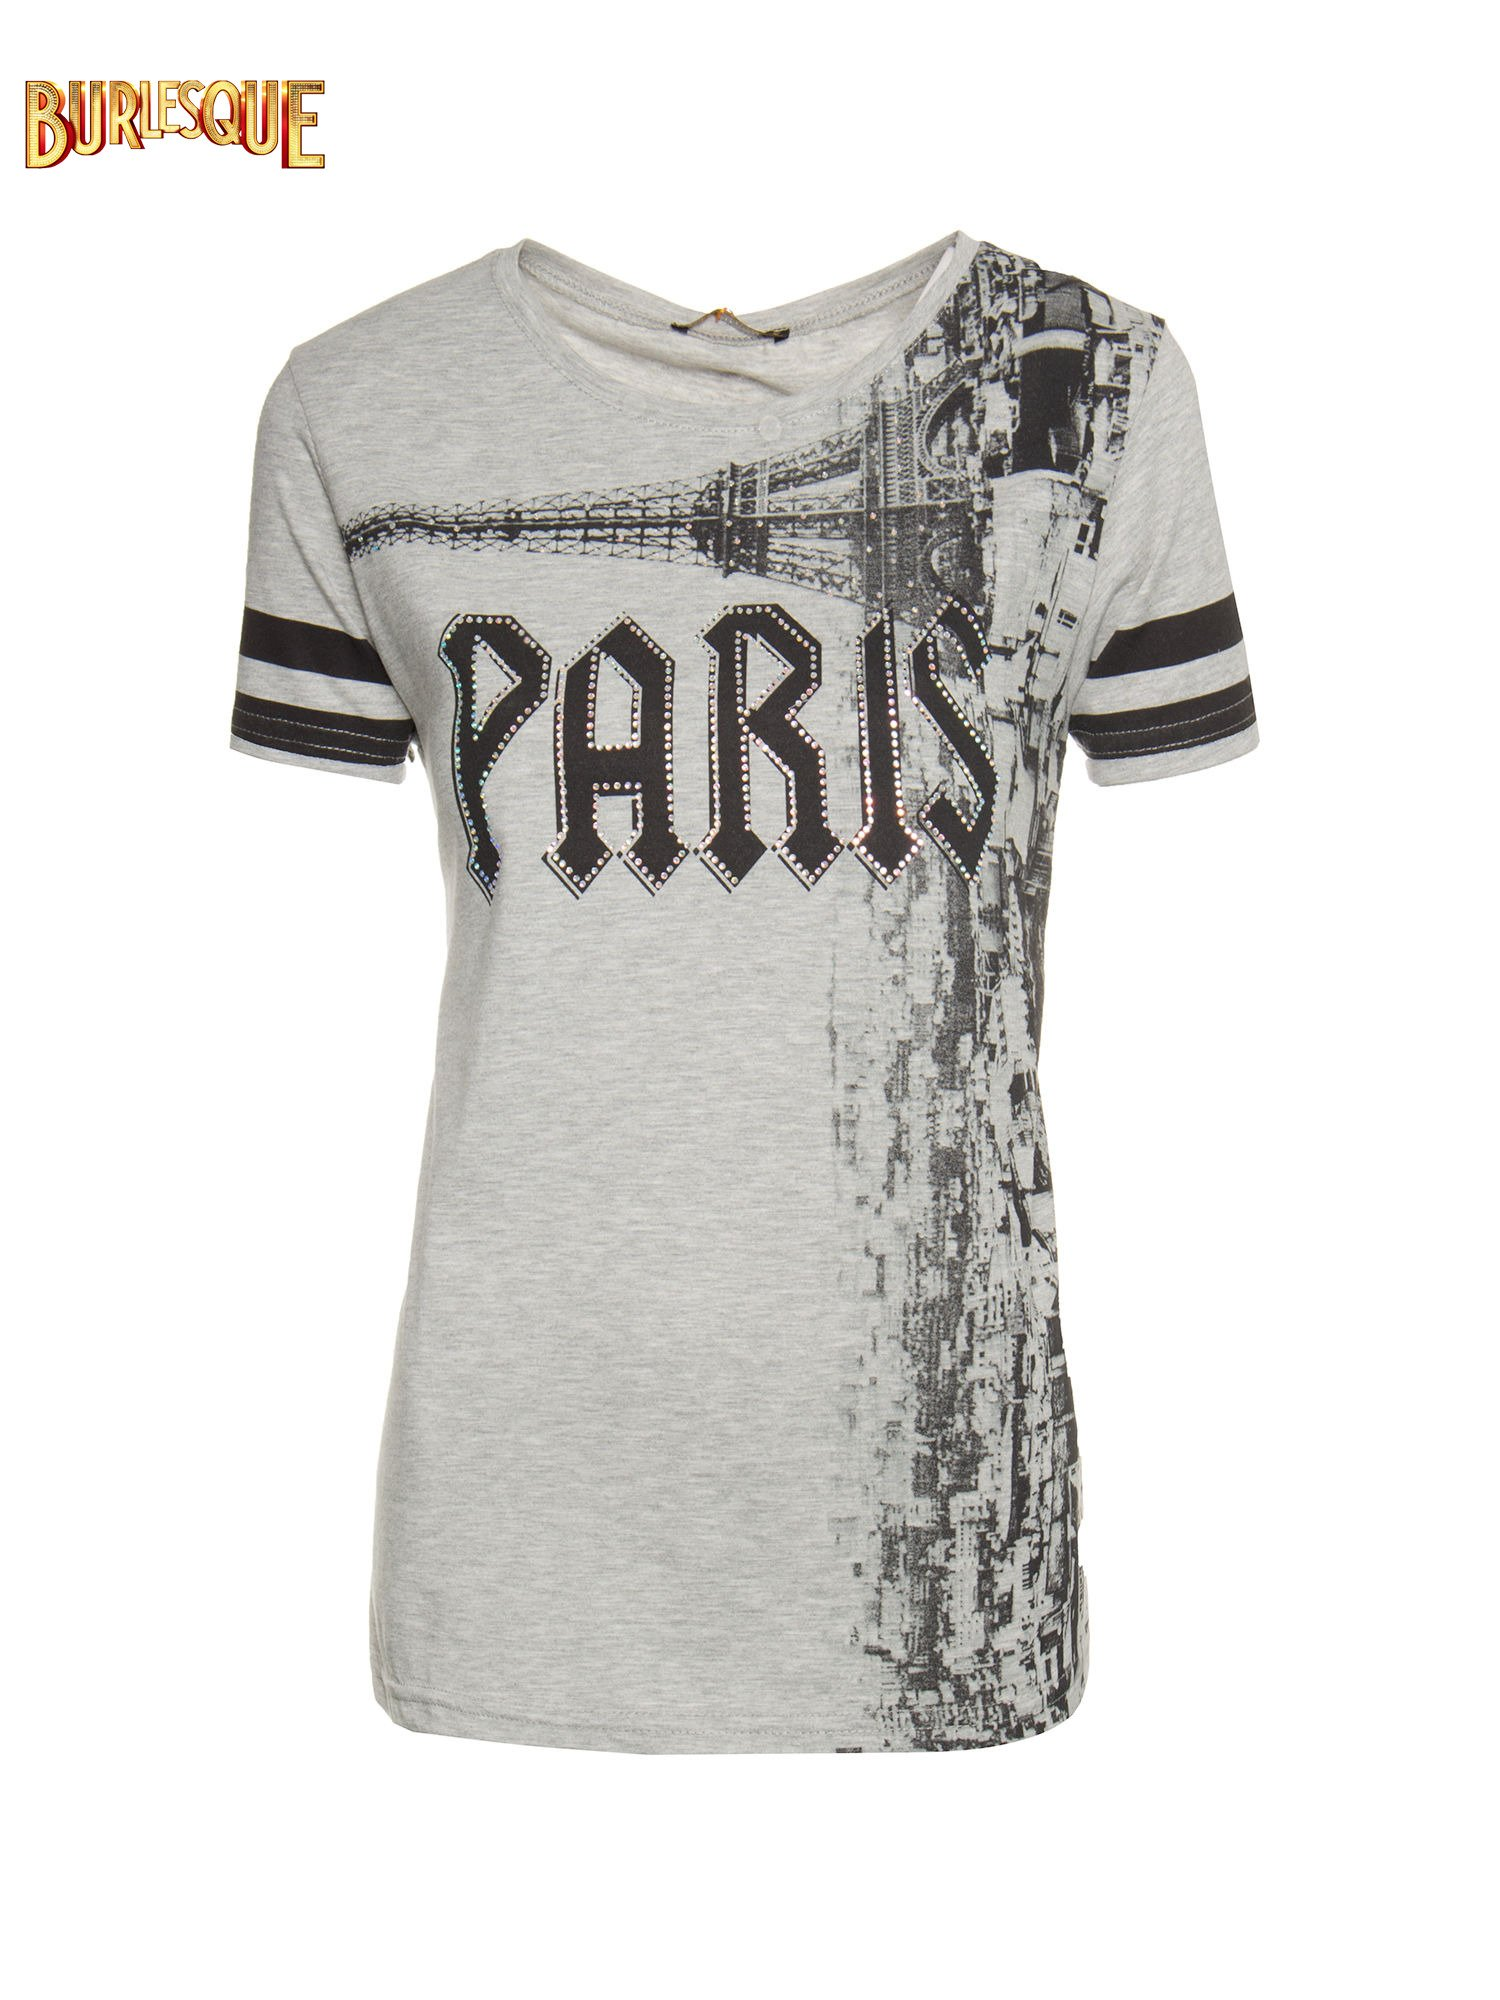 Szary t-shirt z motywem Paryża                                  zdj.                                  1